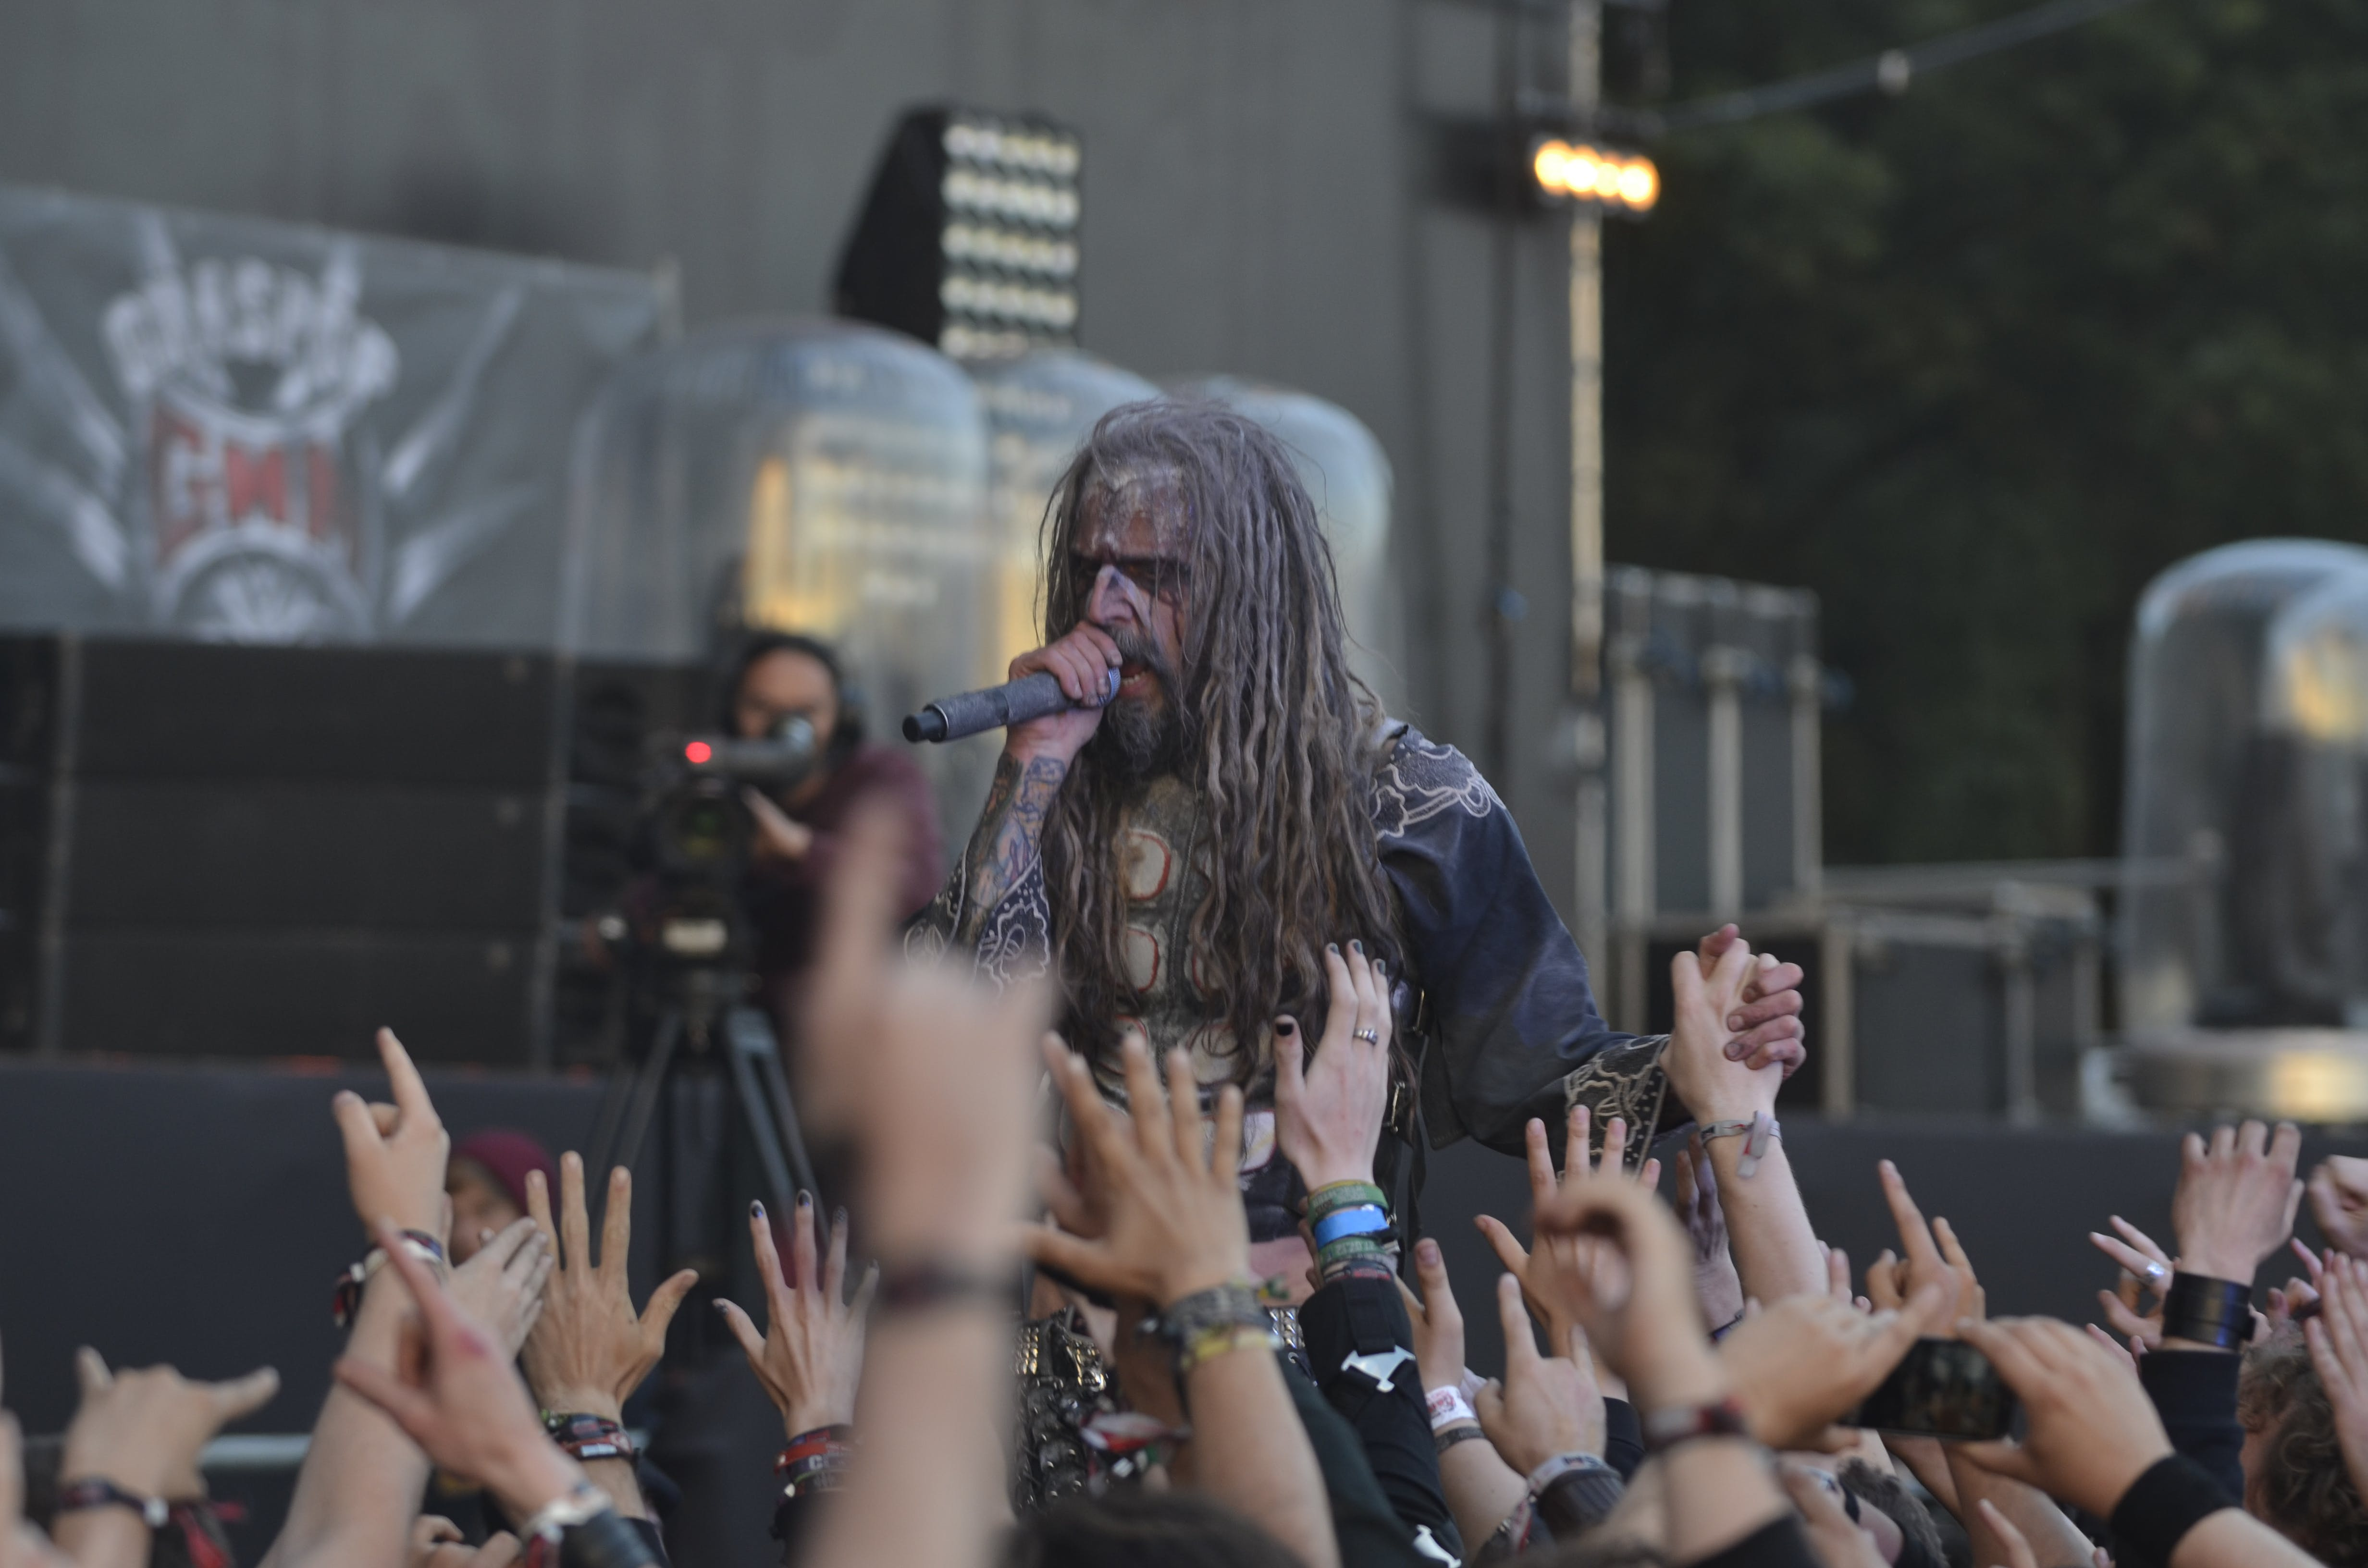 Free stock photo of Rob Zombie - Graspop 2014